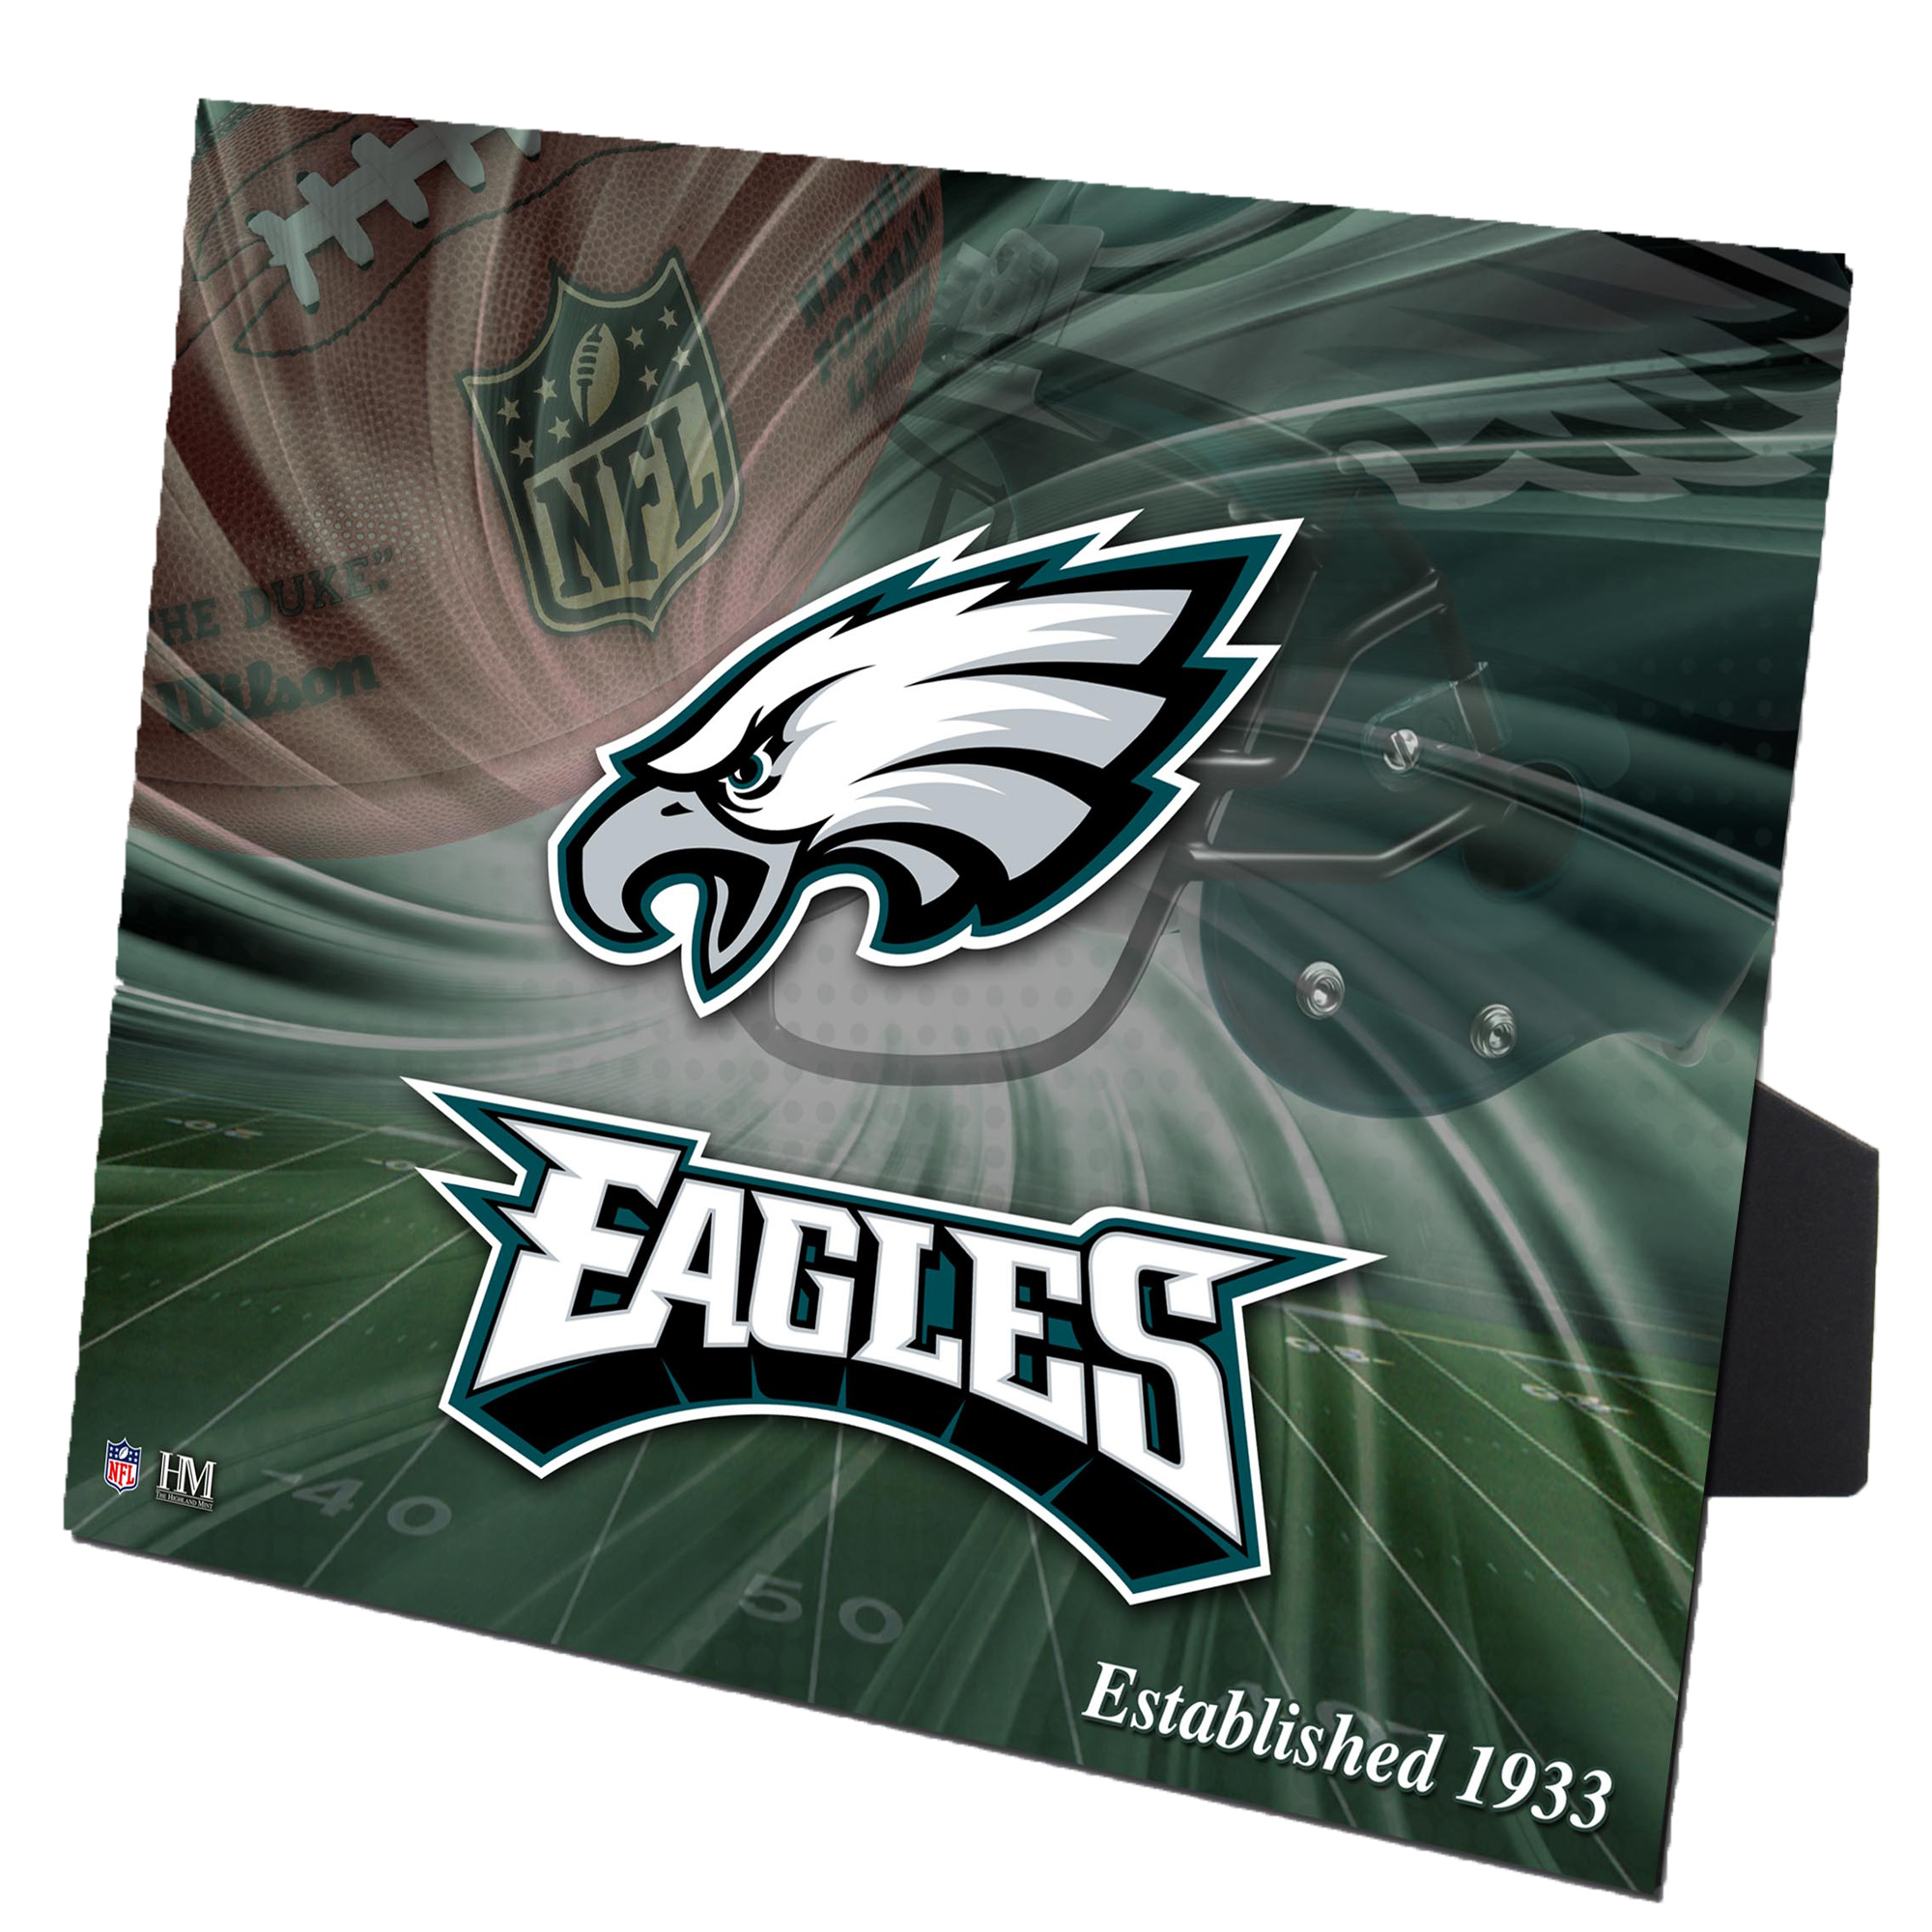 "Philadelphia Eagles Highland Mint 8"" x 10"" PleXart Photo - No Size"